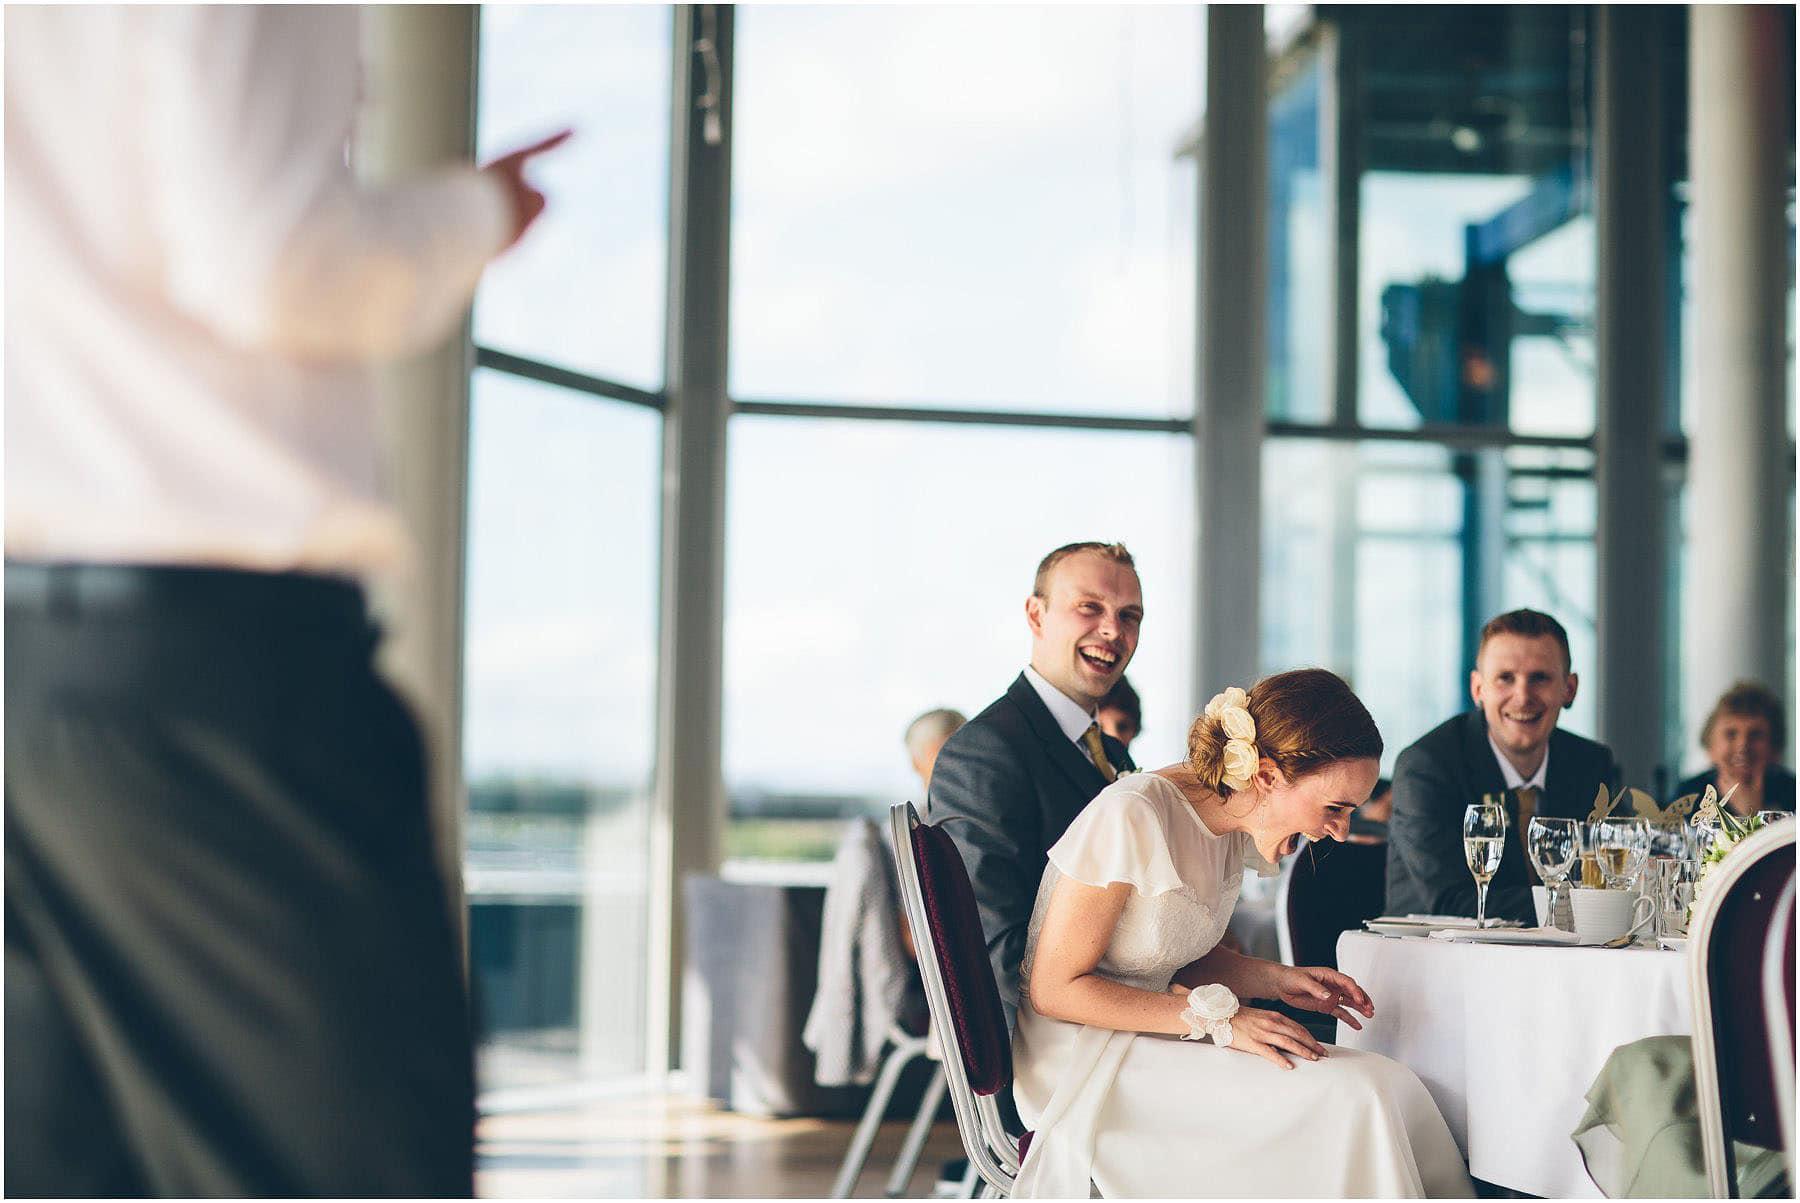 Lowry_Theatre_Wedding_Photography_0102